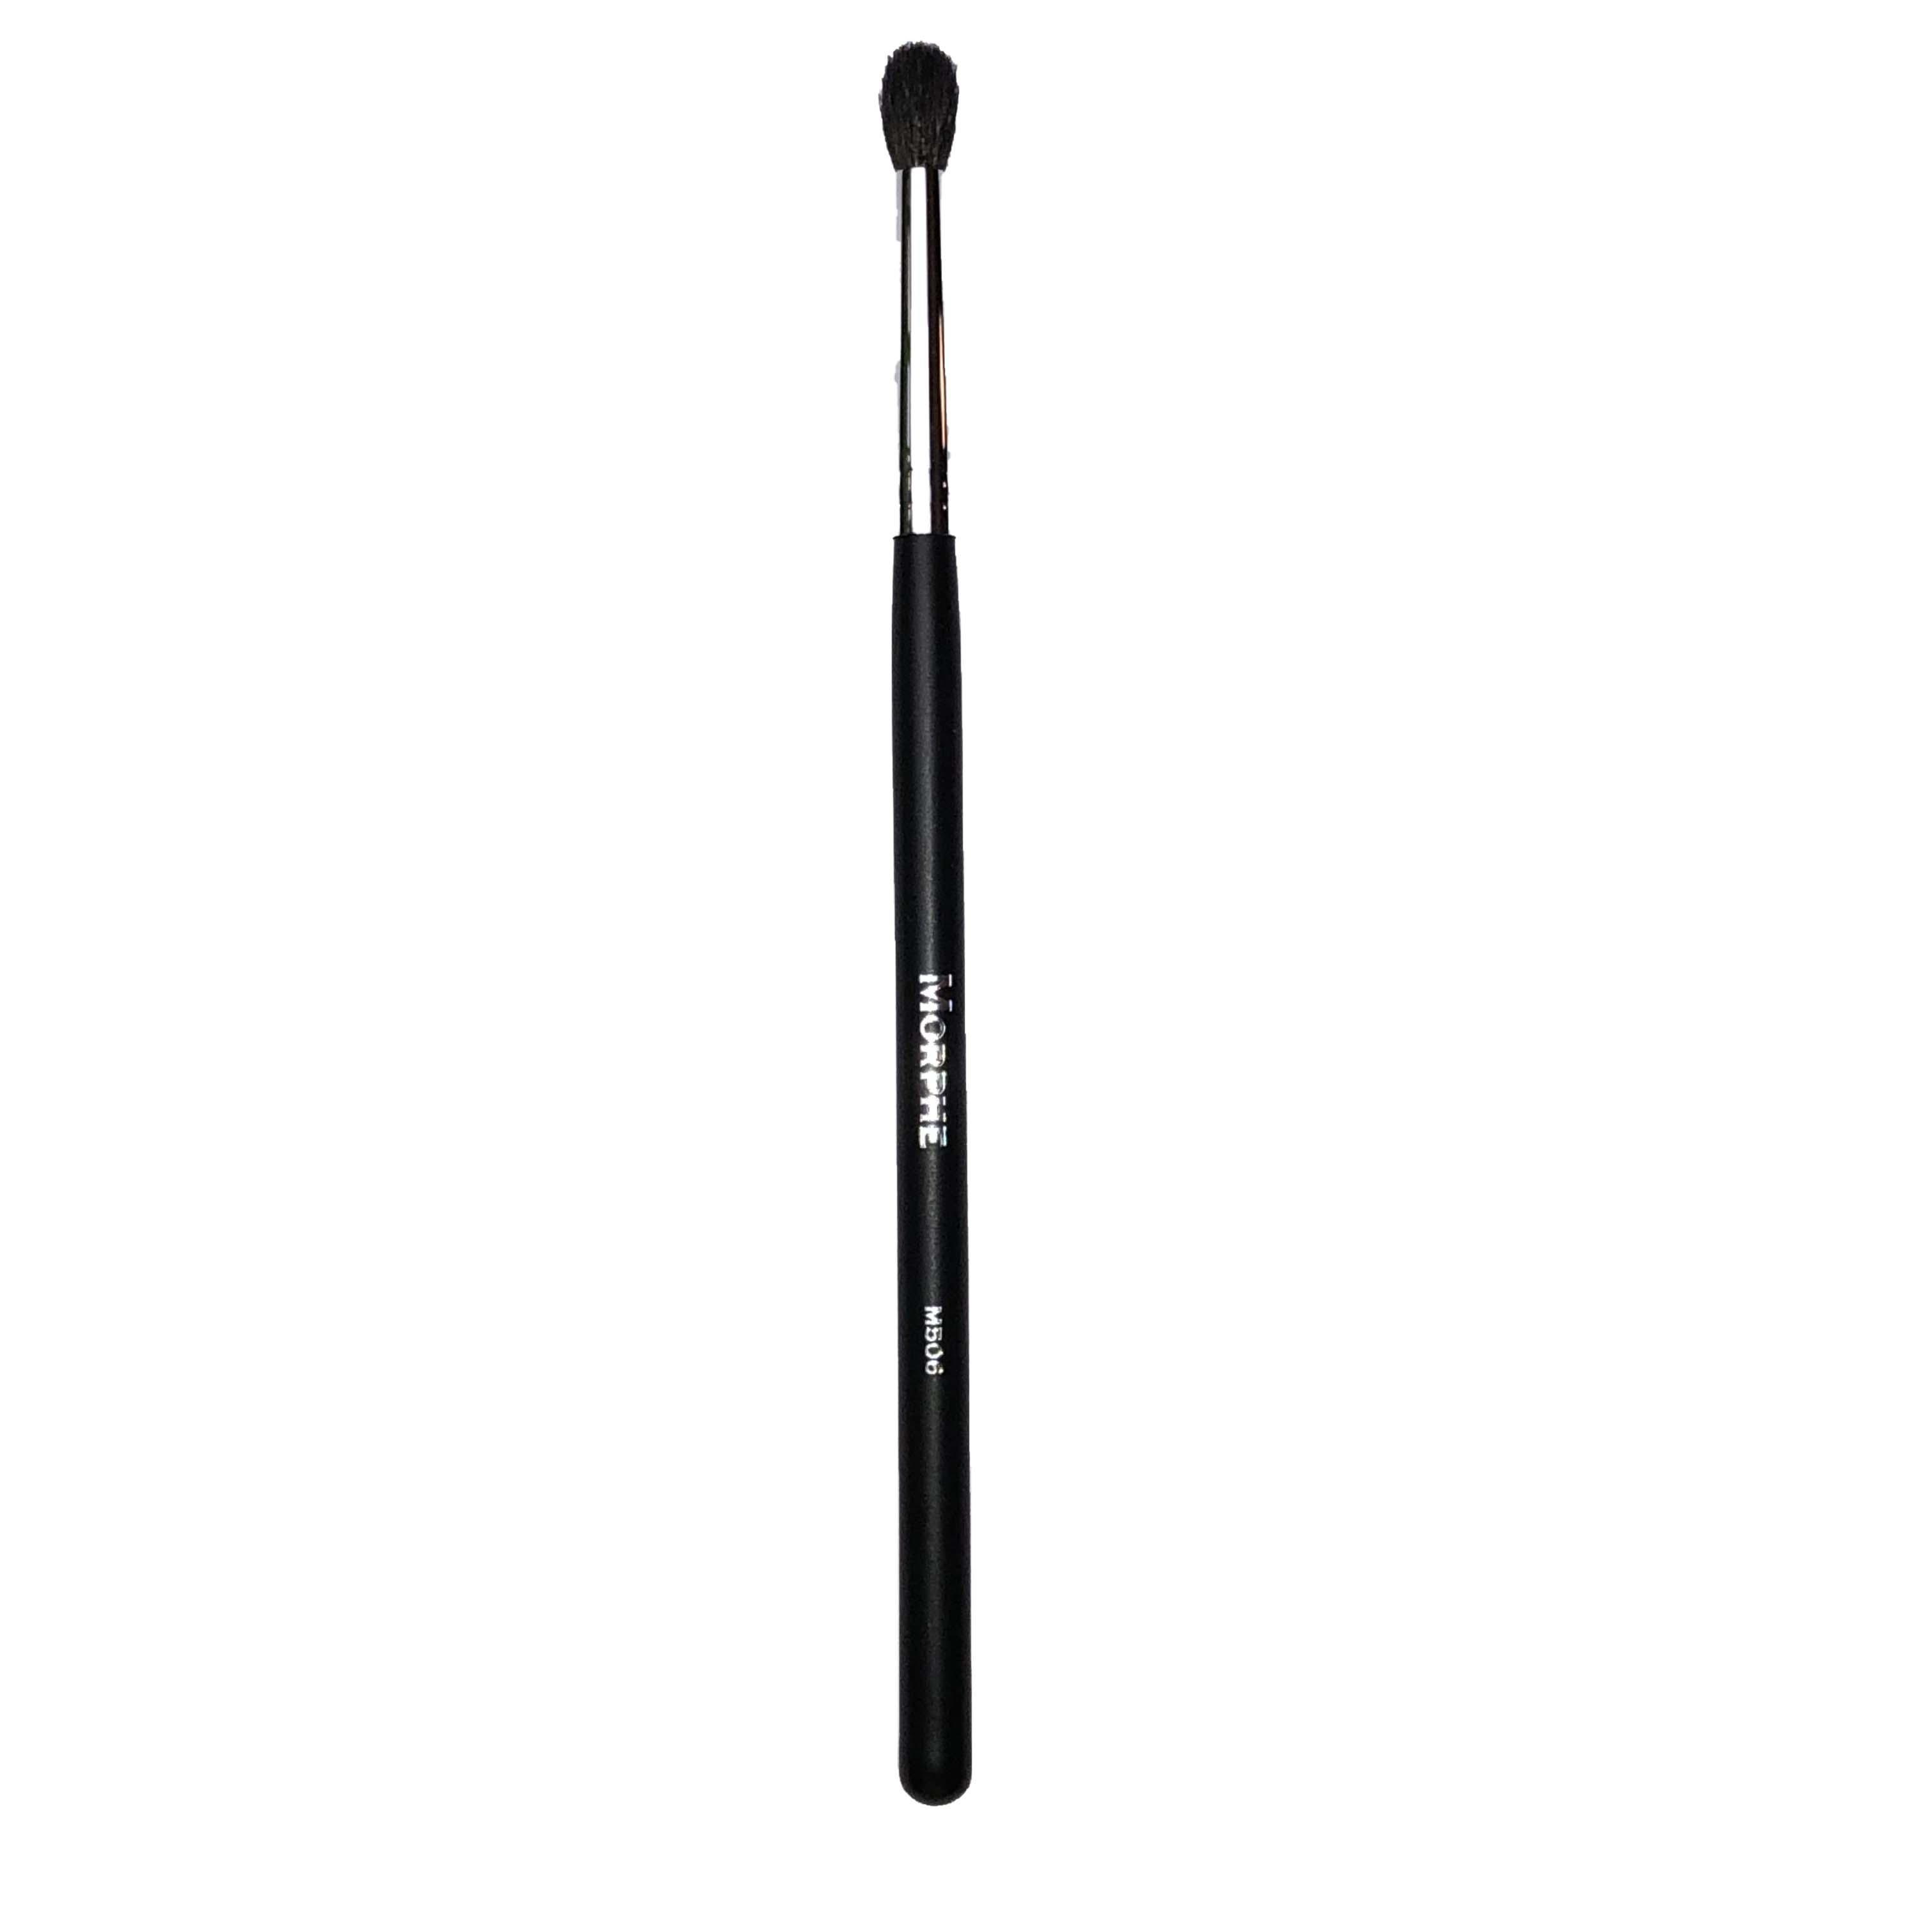 Morphe Pro Eye Brush M506